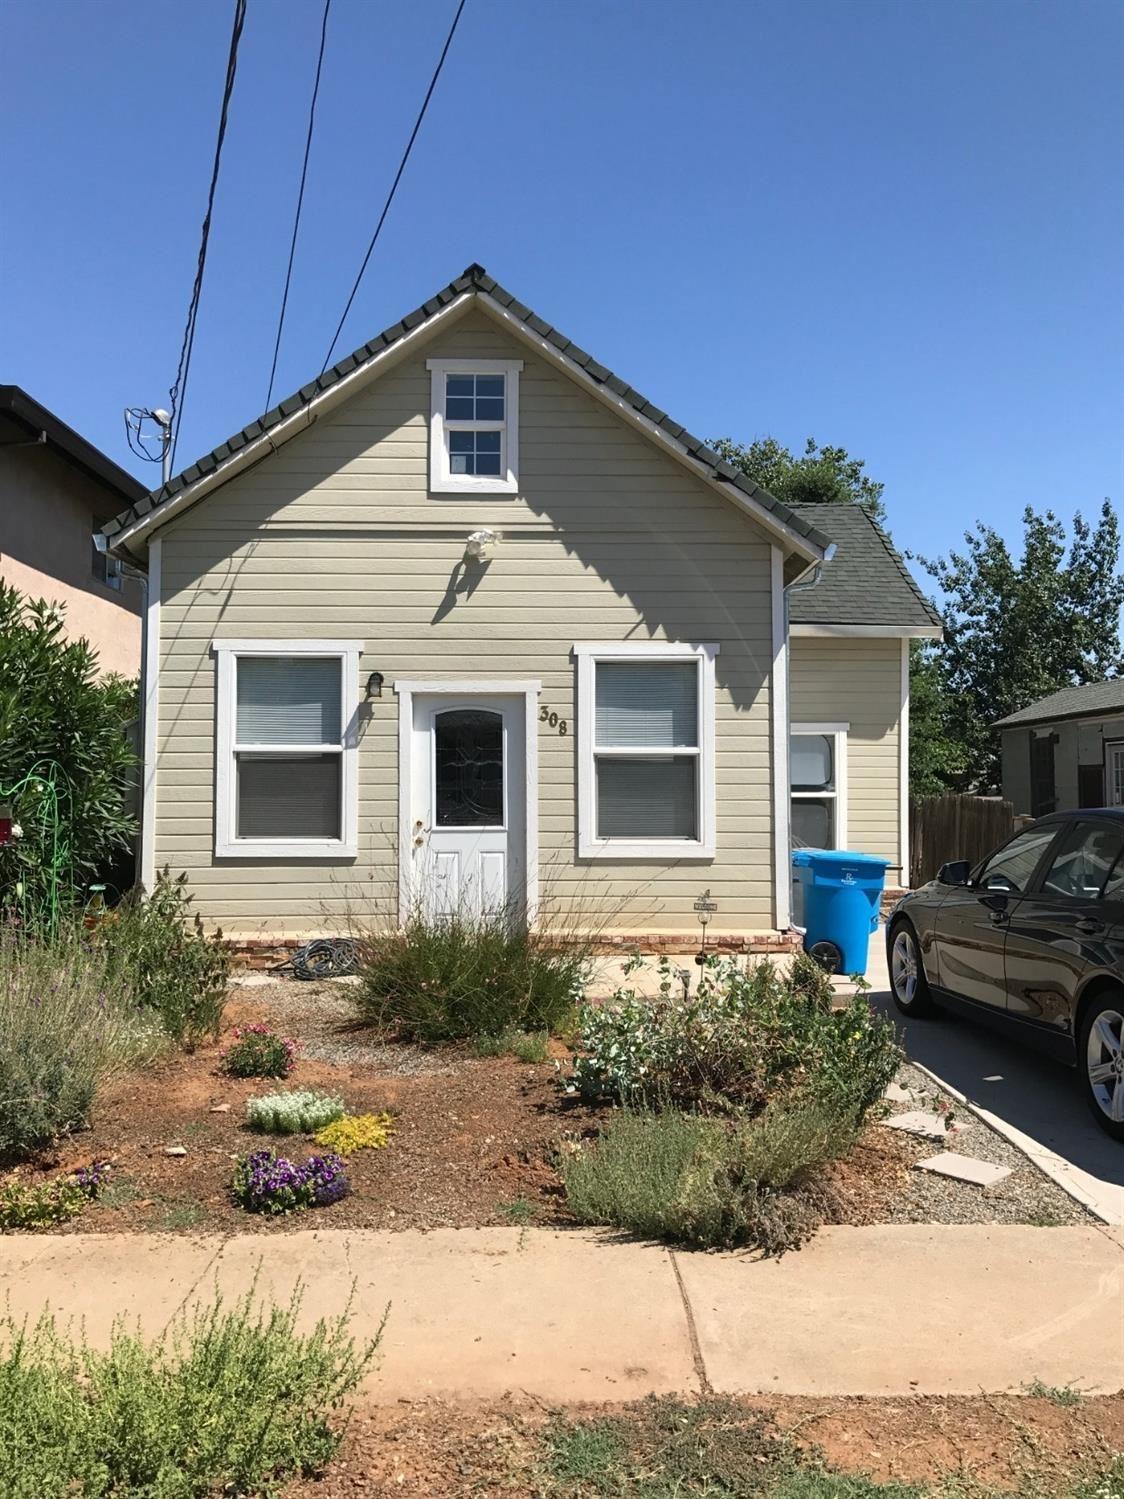 308 Main Street, Wheatland, CA 95692 - #: 202002414